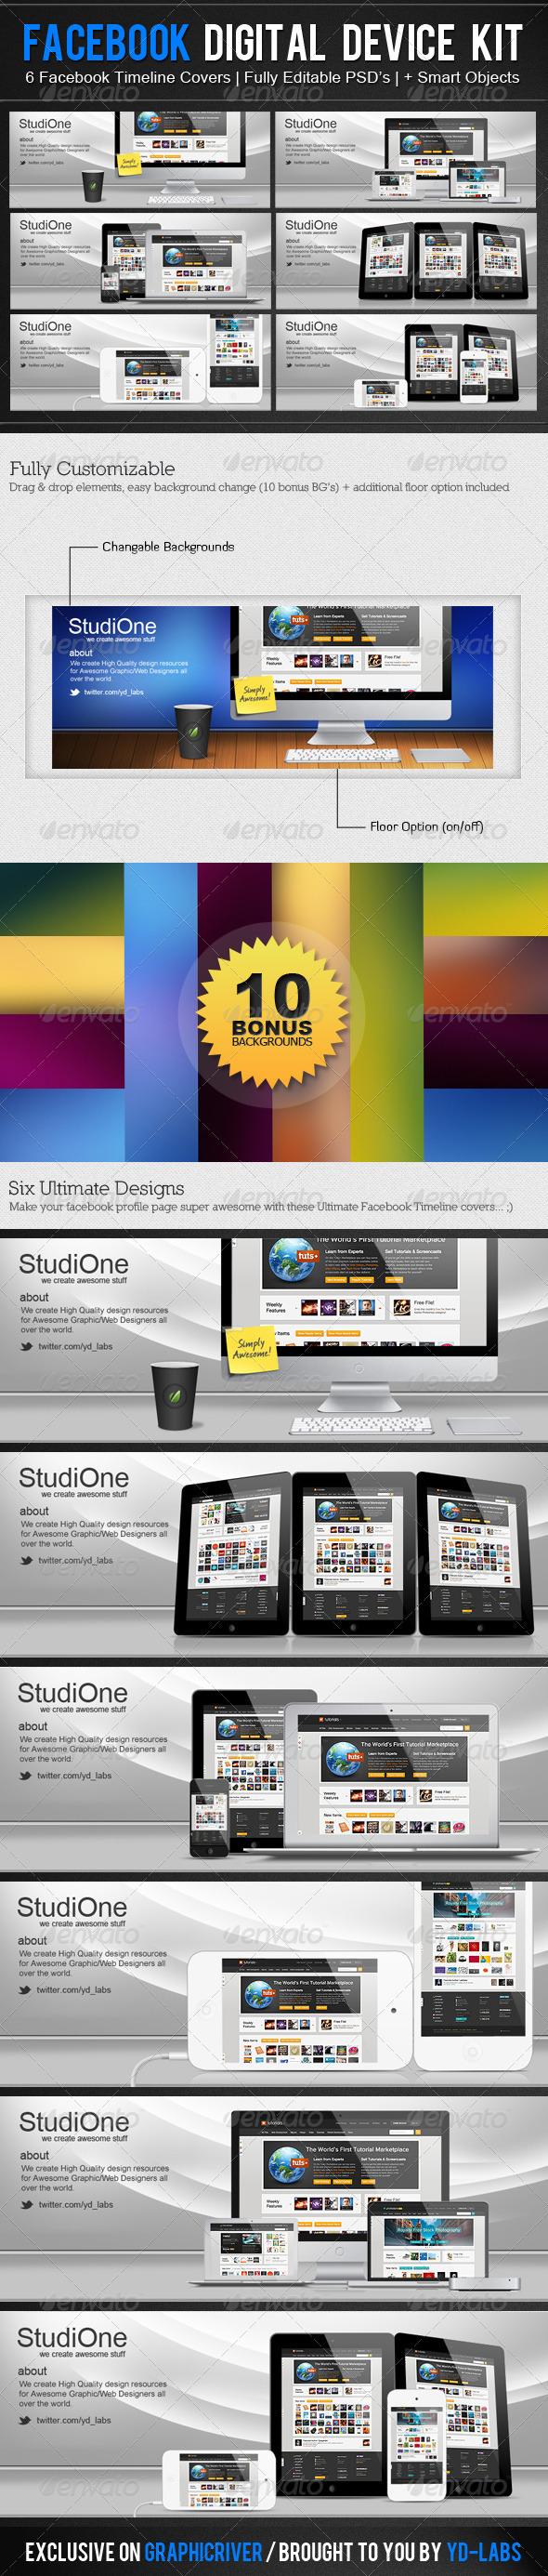 FB Digital Device Kit - Facebook Timeline Covers Social Media